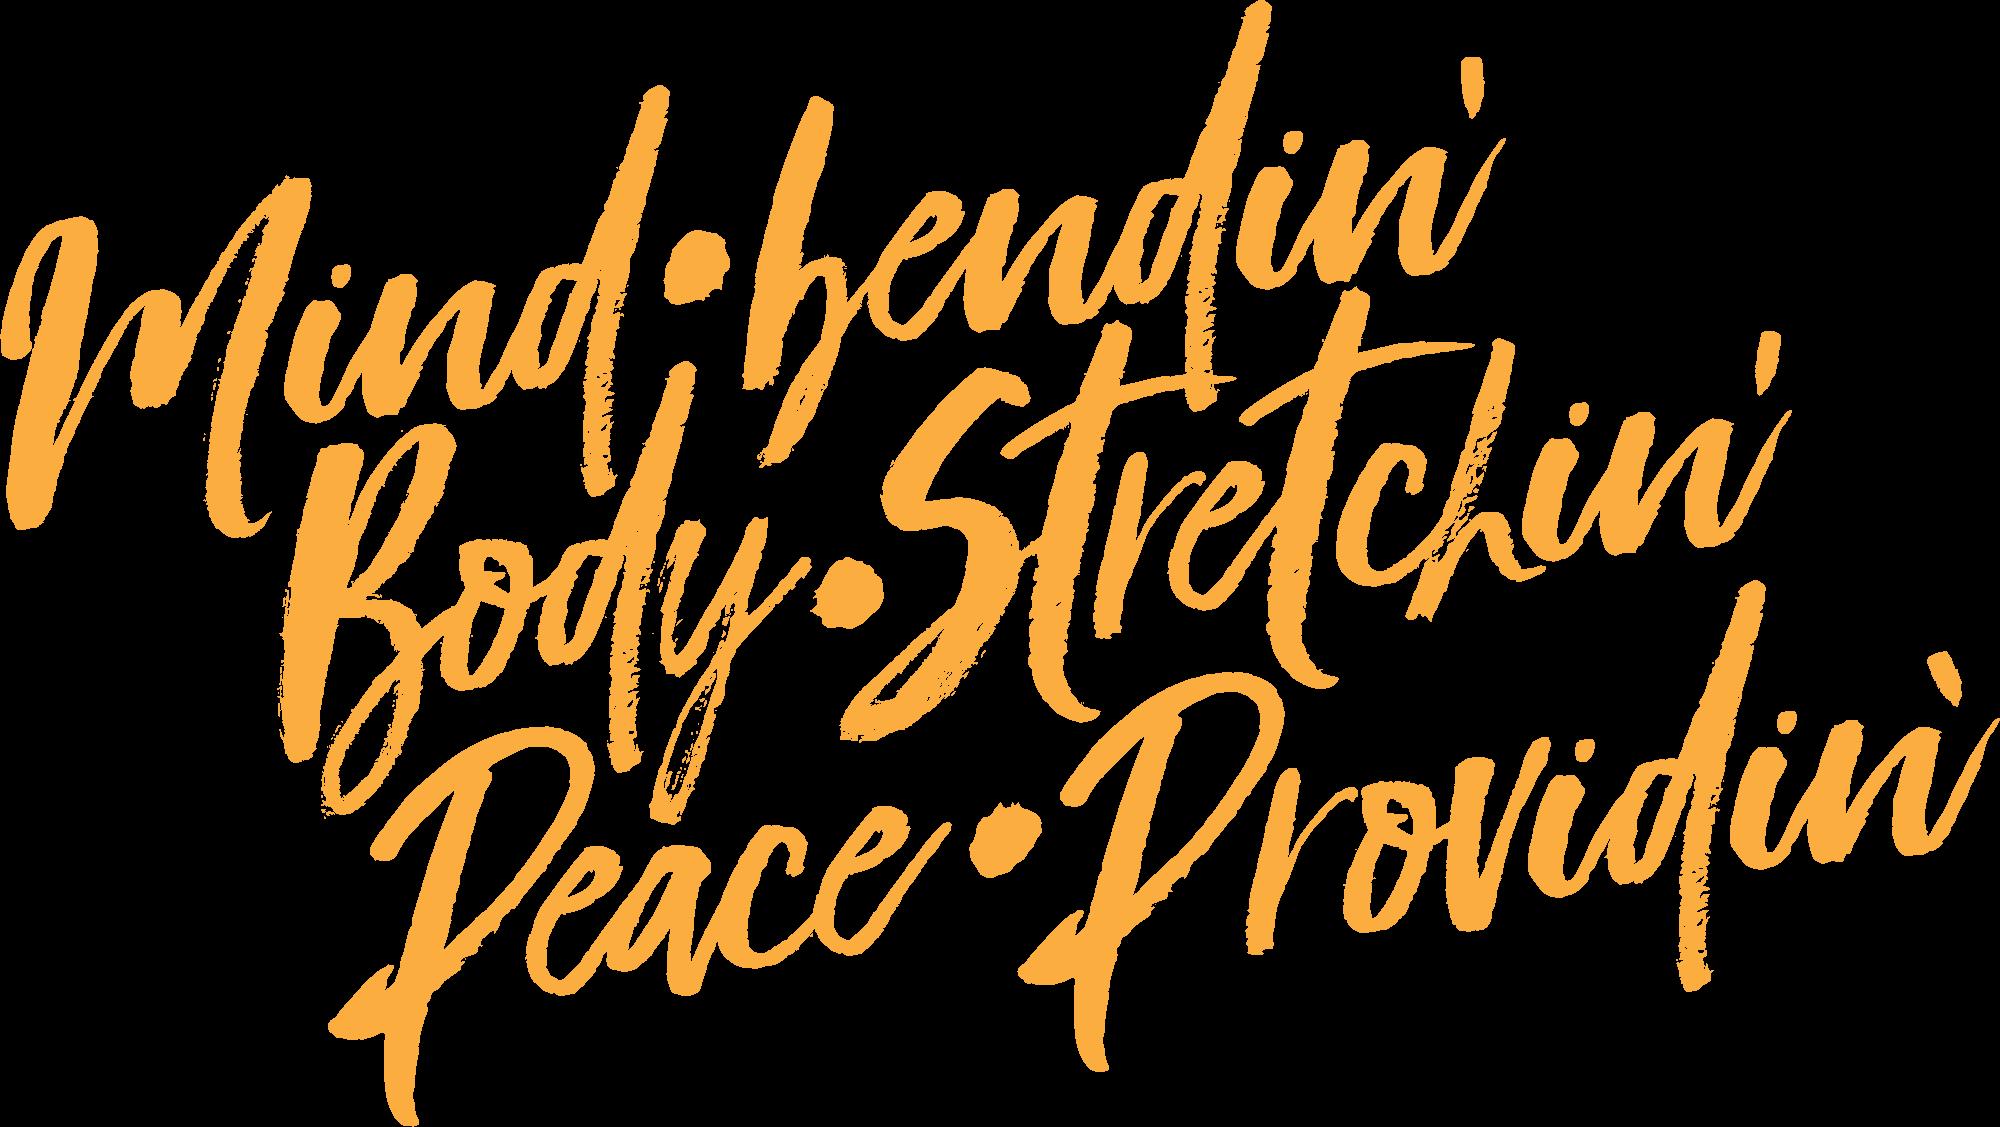 Yoga Portland Mantra